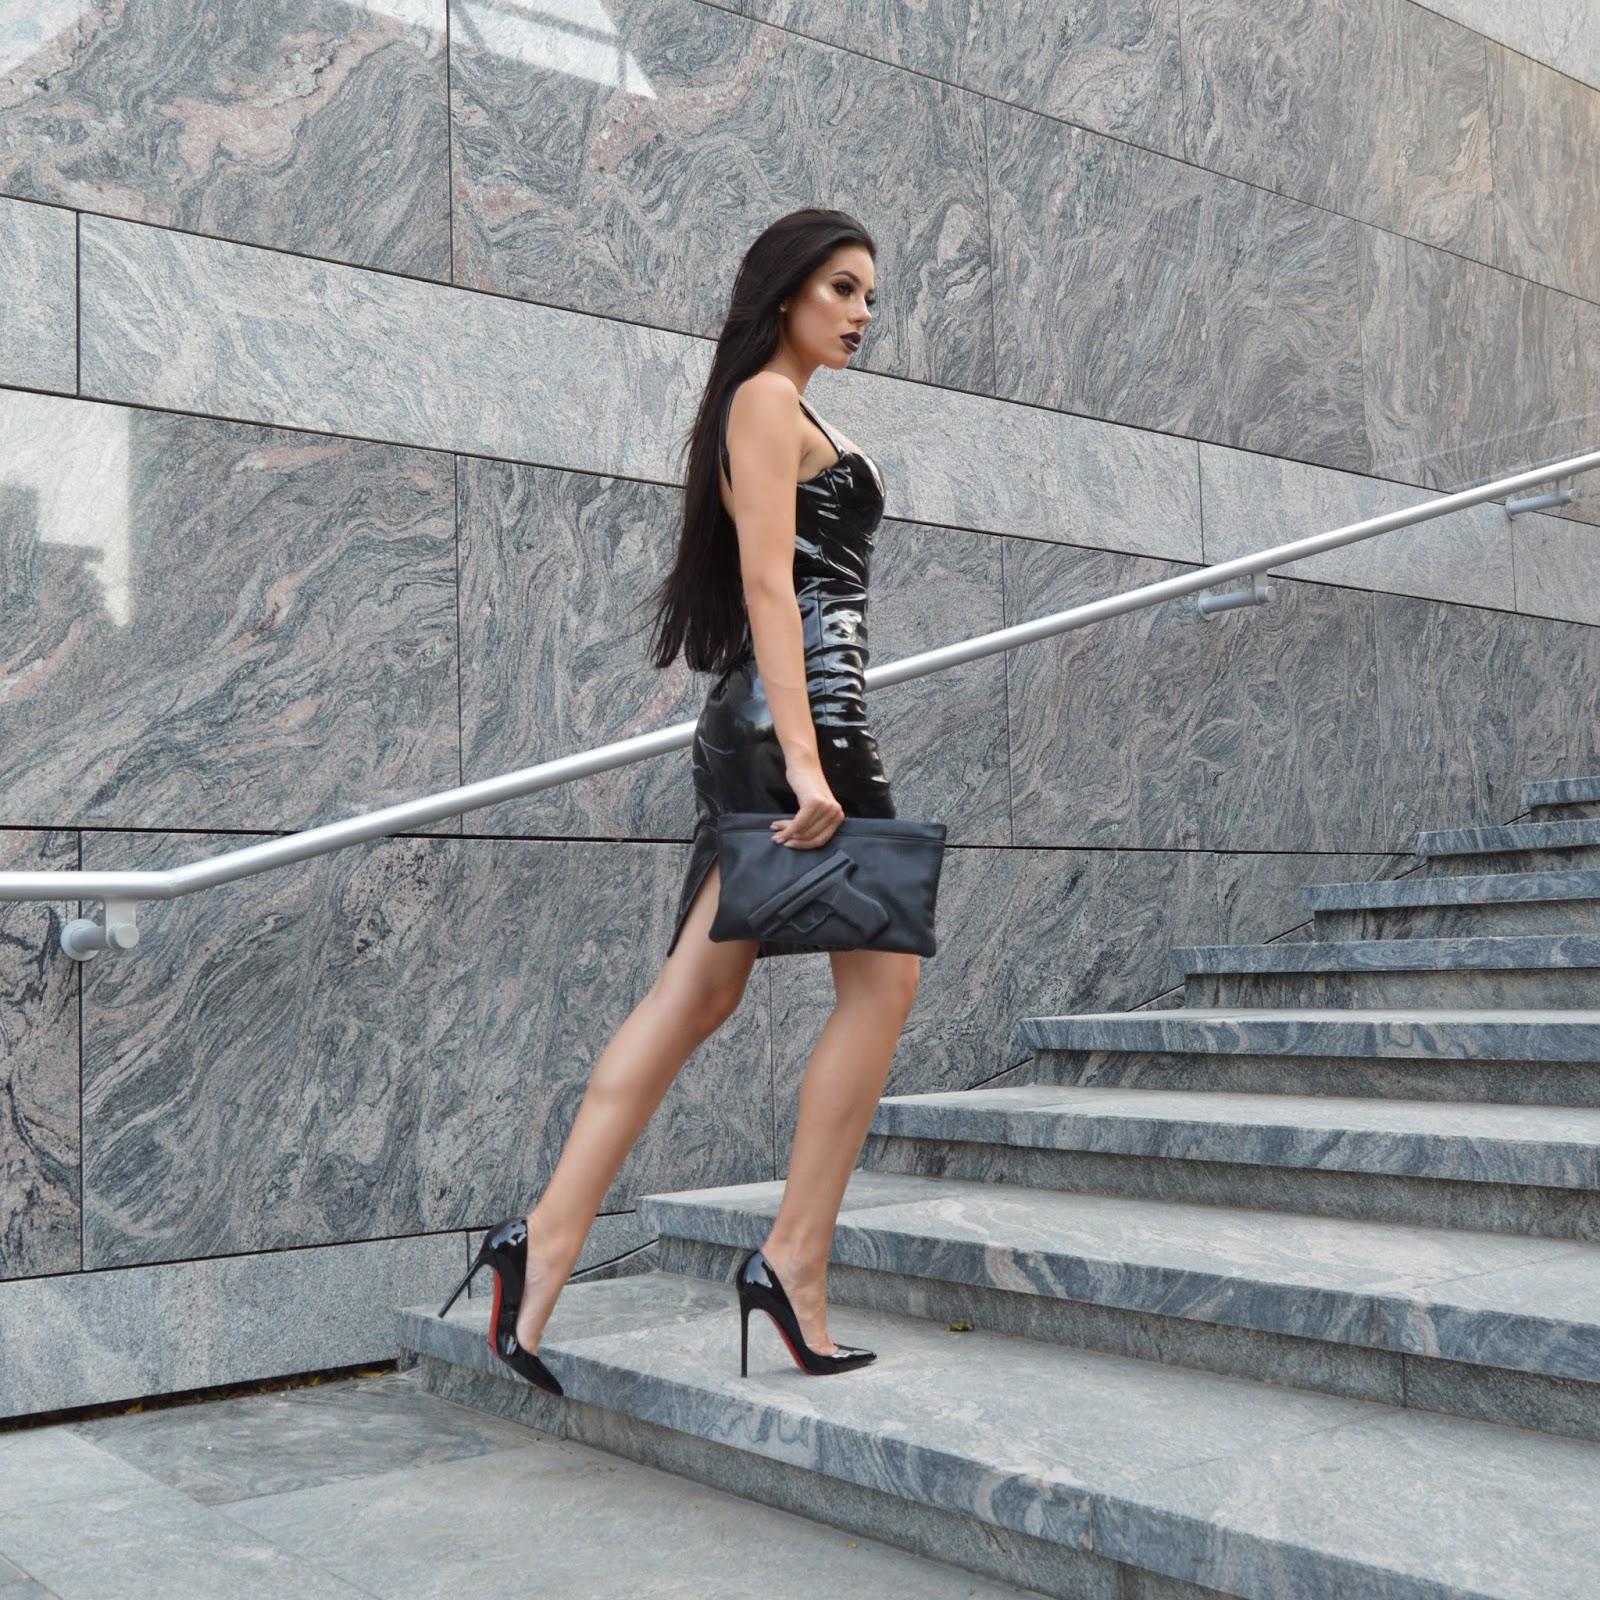 Amazing Laura Badura Pictures & Backgrounds